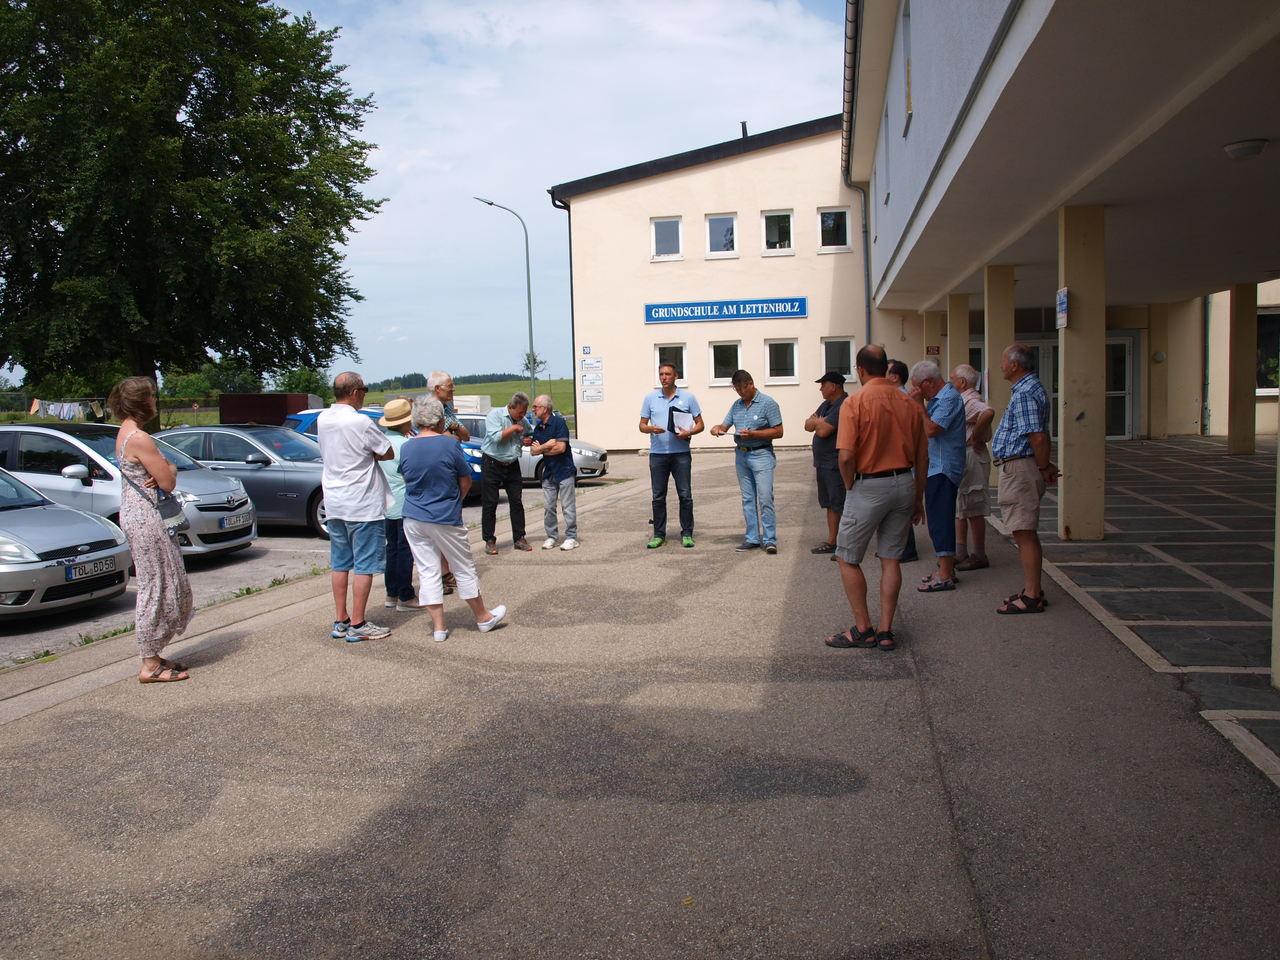 Vor der Grundschule am Lettenholz, wo das Stadtgespräch beginnt bei ca. 32° beginnt.